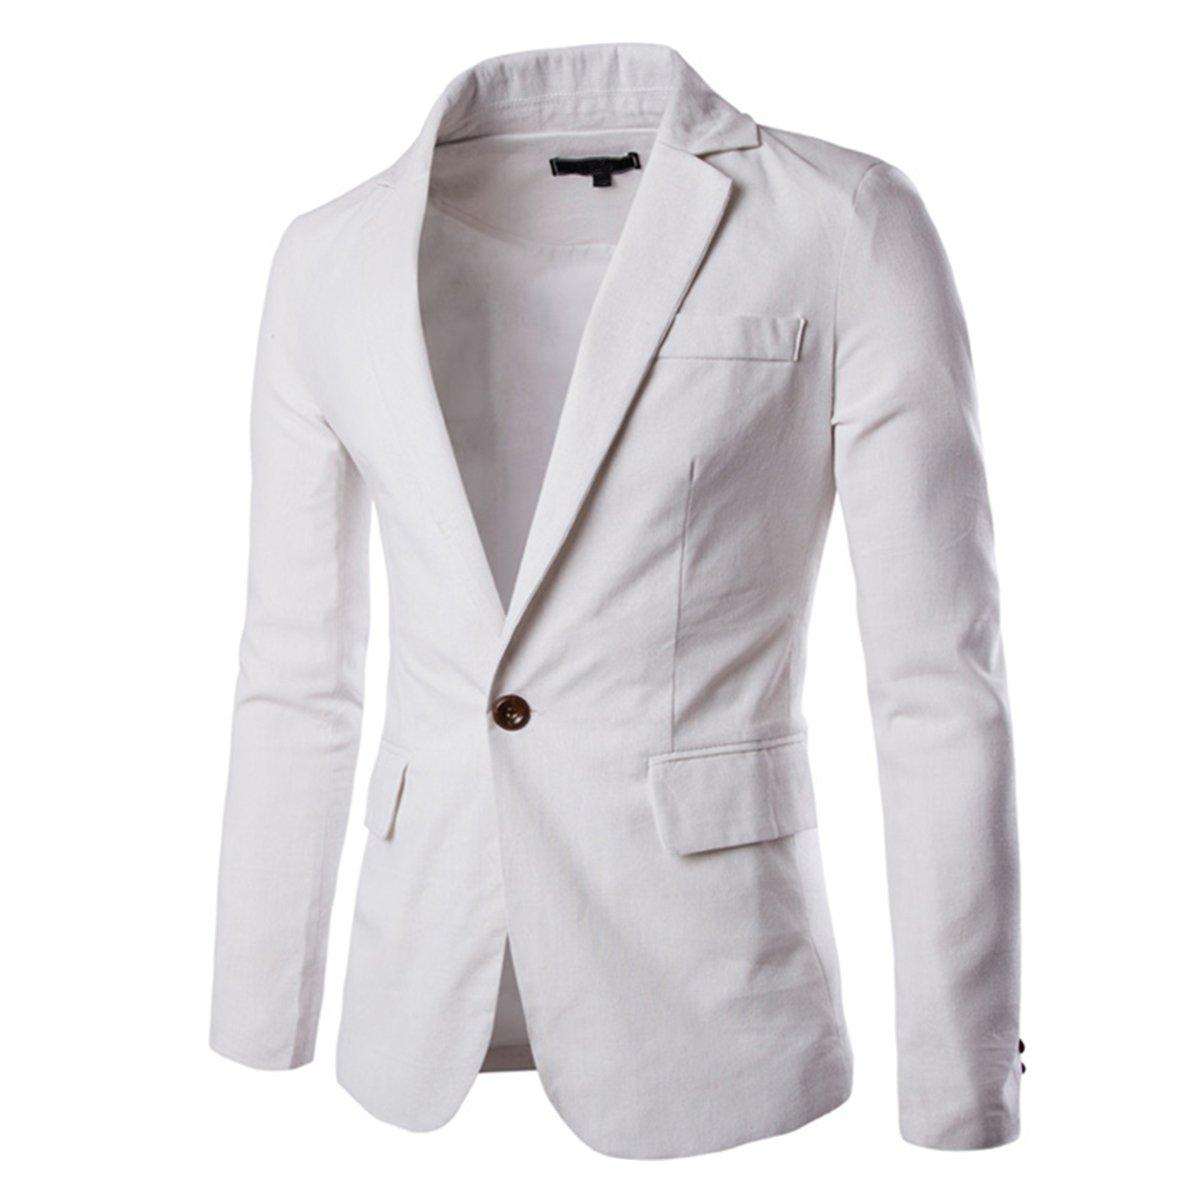 Pishon Men's Linen Blazer Lightweight Casual Solid One Button Slim Fit Sport Coat, White, Tag Size XL=US Size S